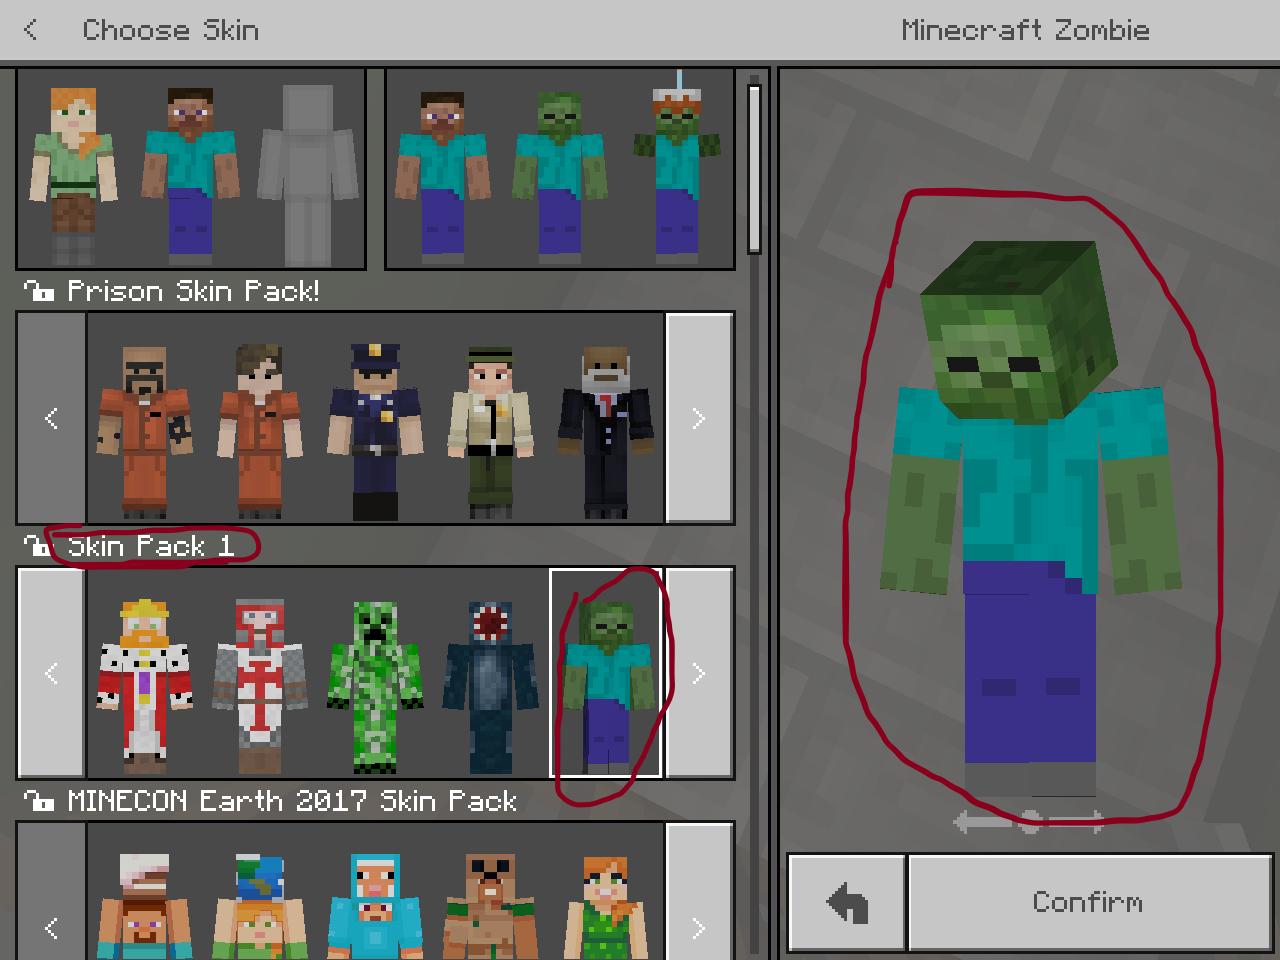 MCPE-100] Minecraft Skin Pack 10 Zombie Bug - Jira